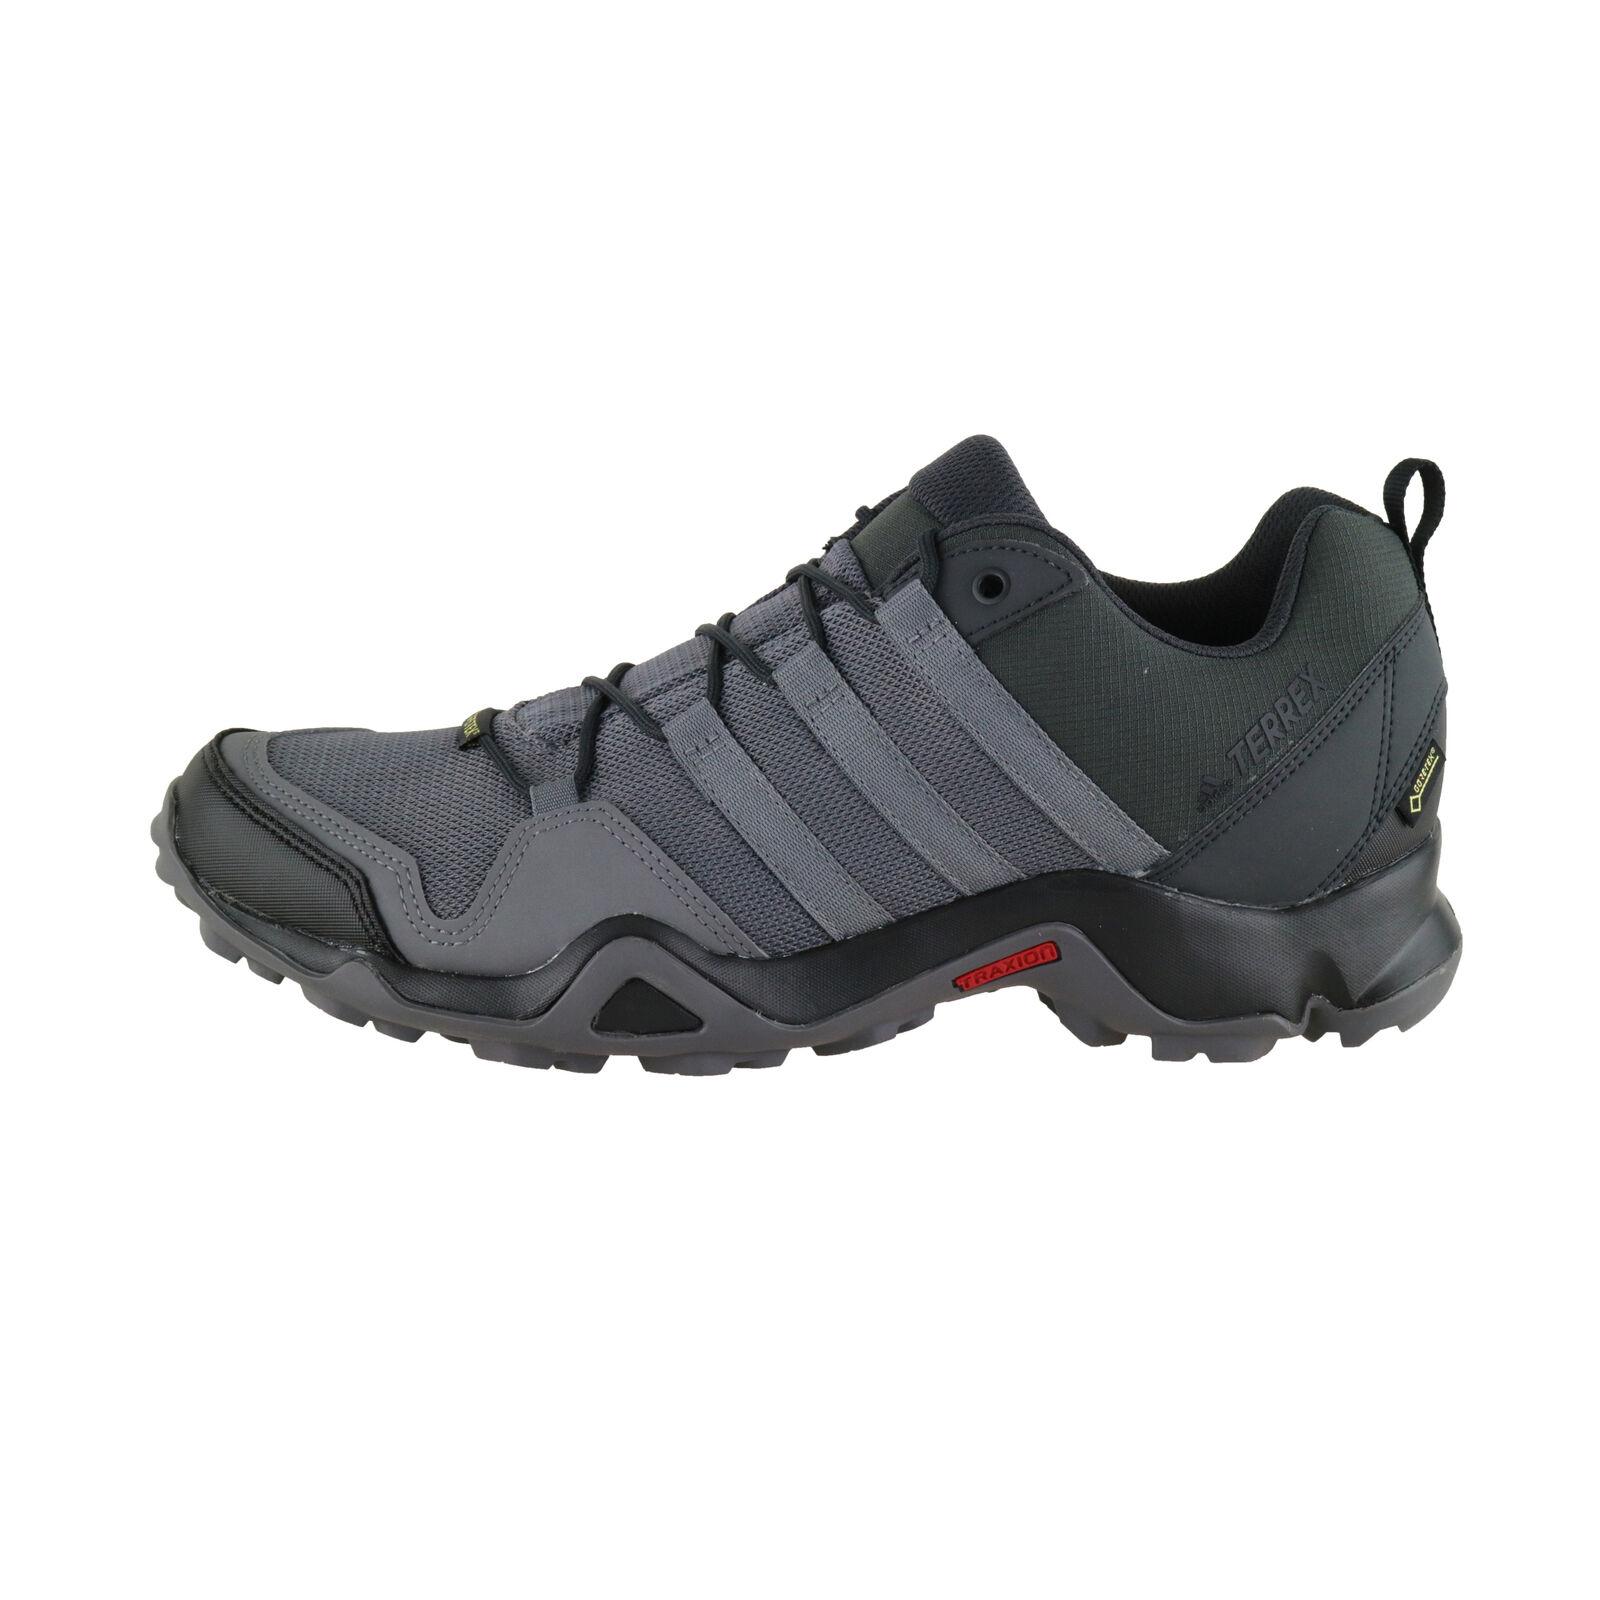 Adidas Terrex AX2R GTX grau schwarz CM7718  | Günstig